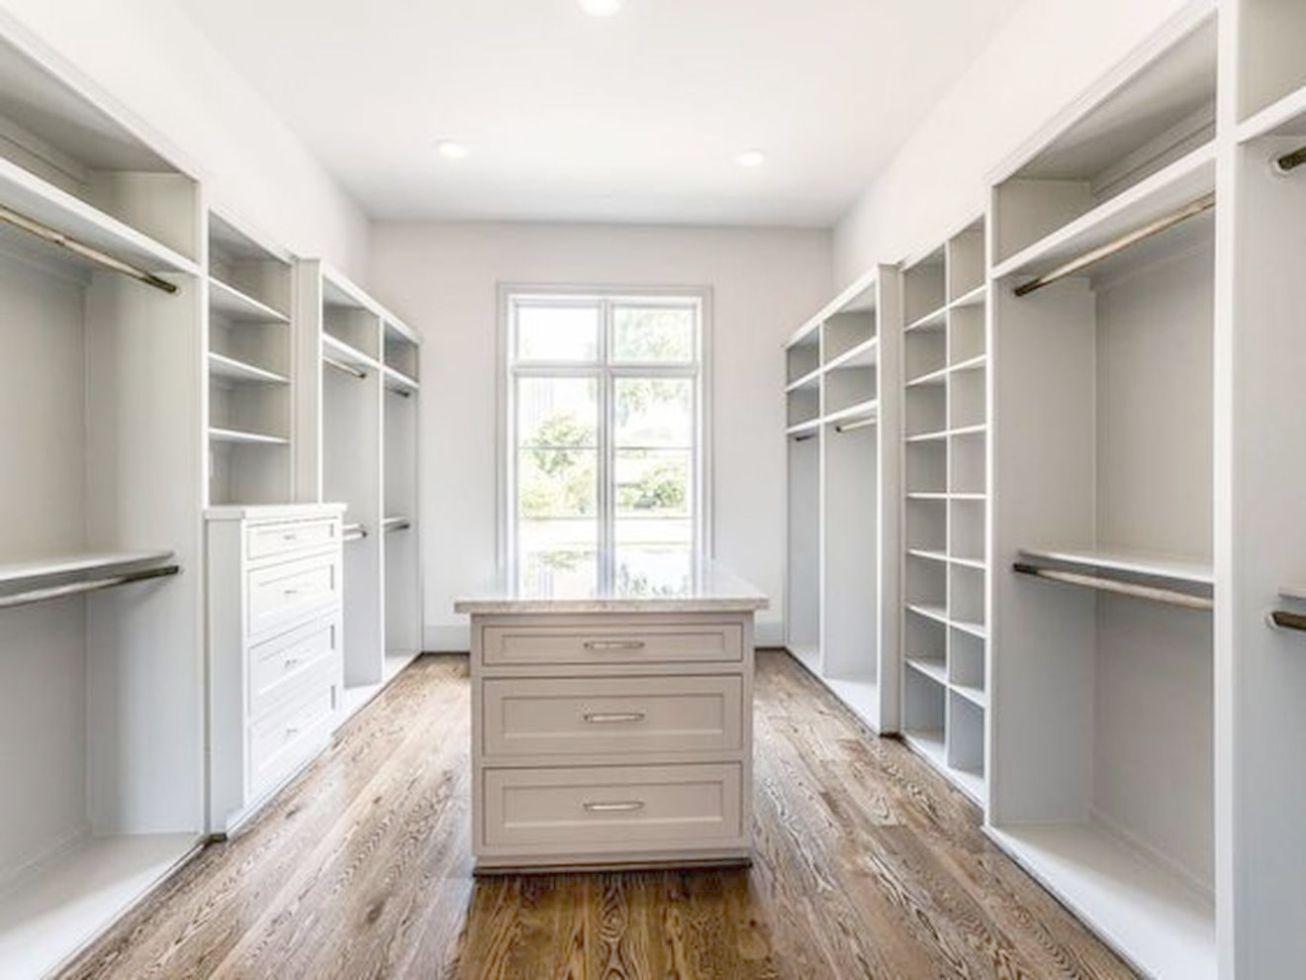 Best Furniture Stores Near Me Second Hand Regarding Furniture 400 x 300